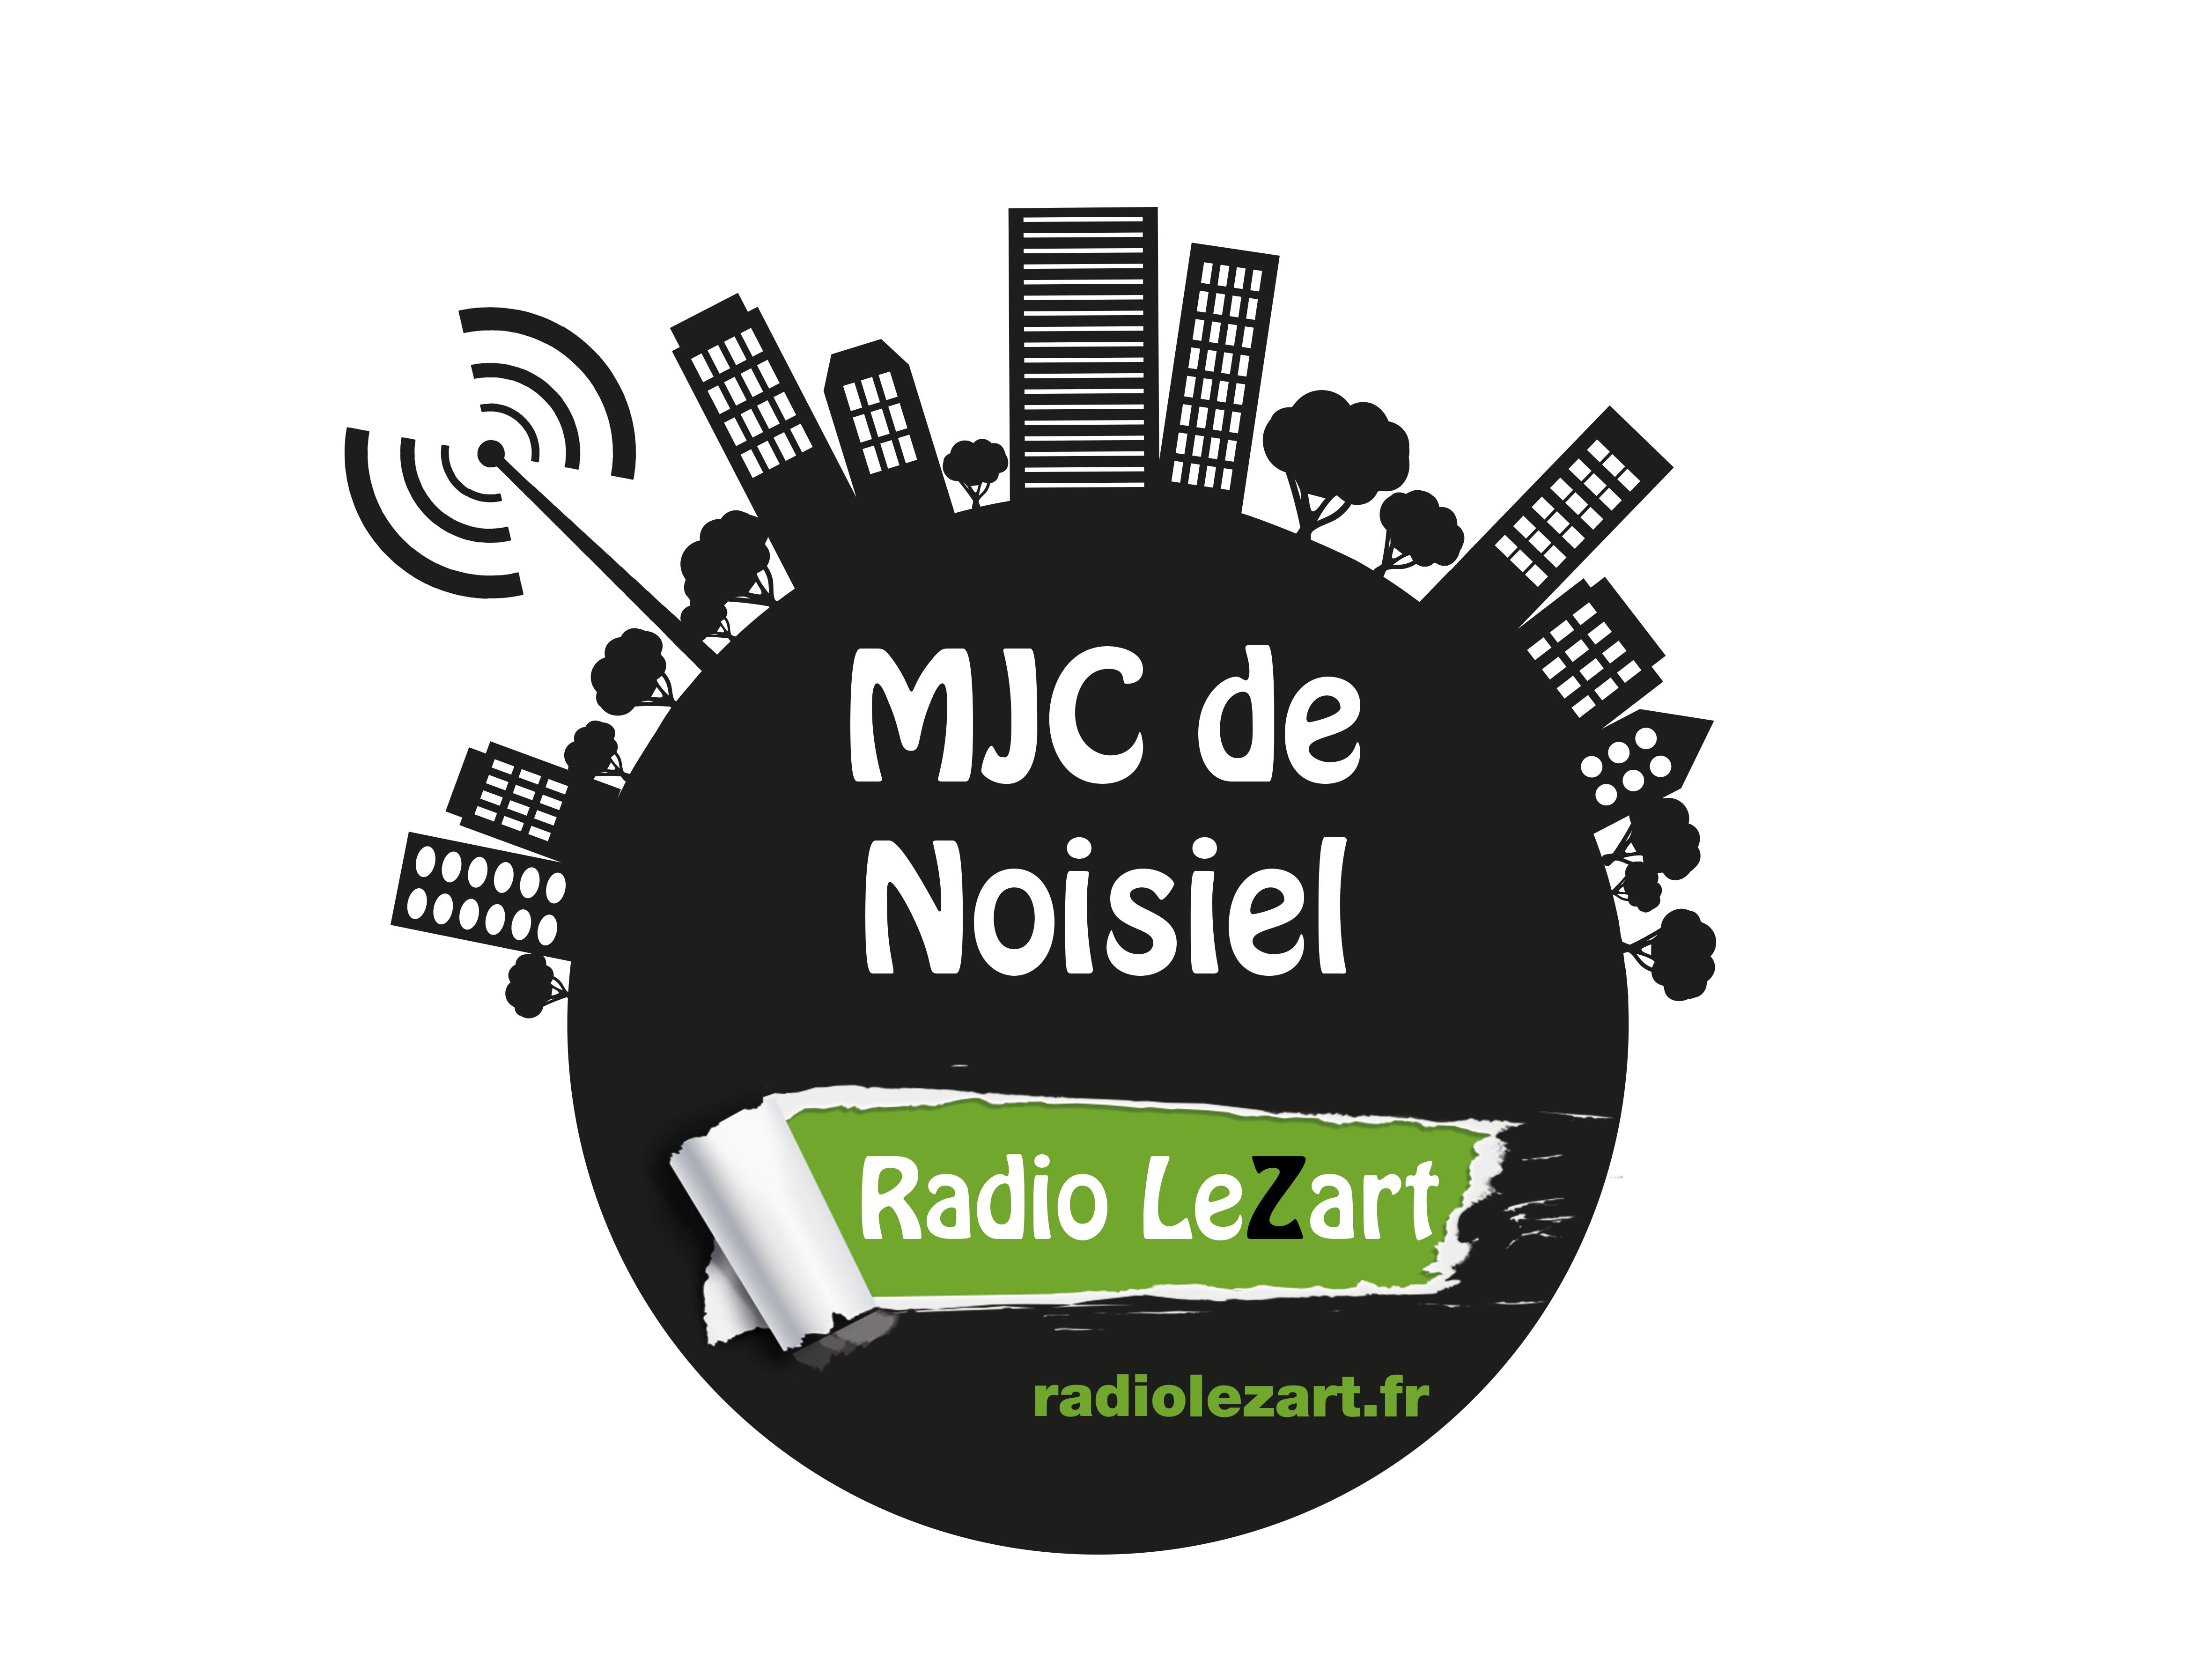 RadioLezart8noisiel